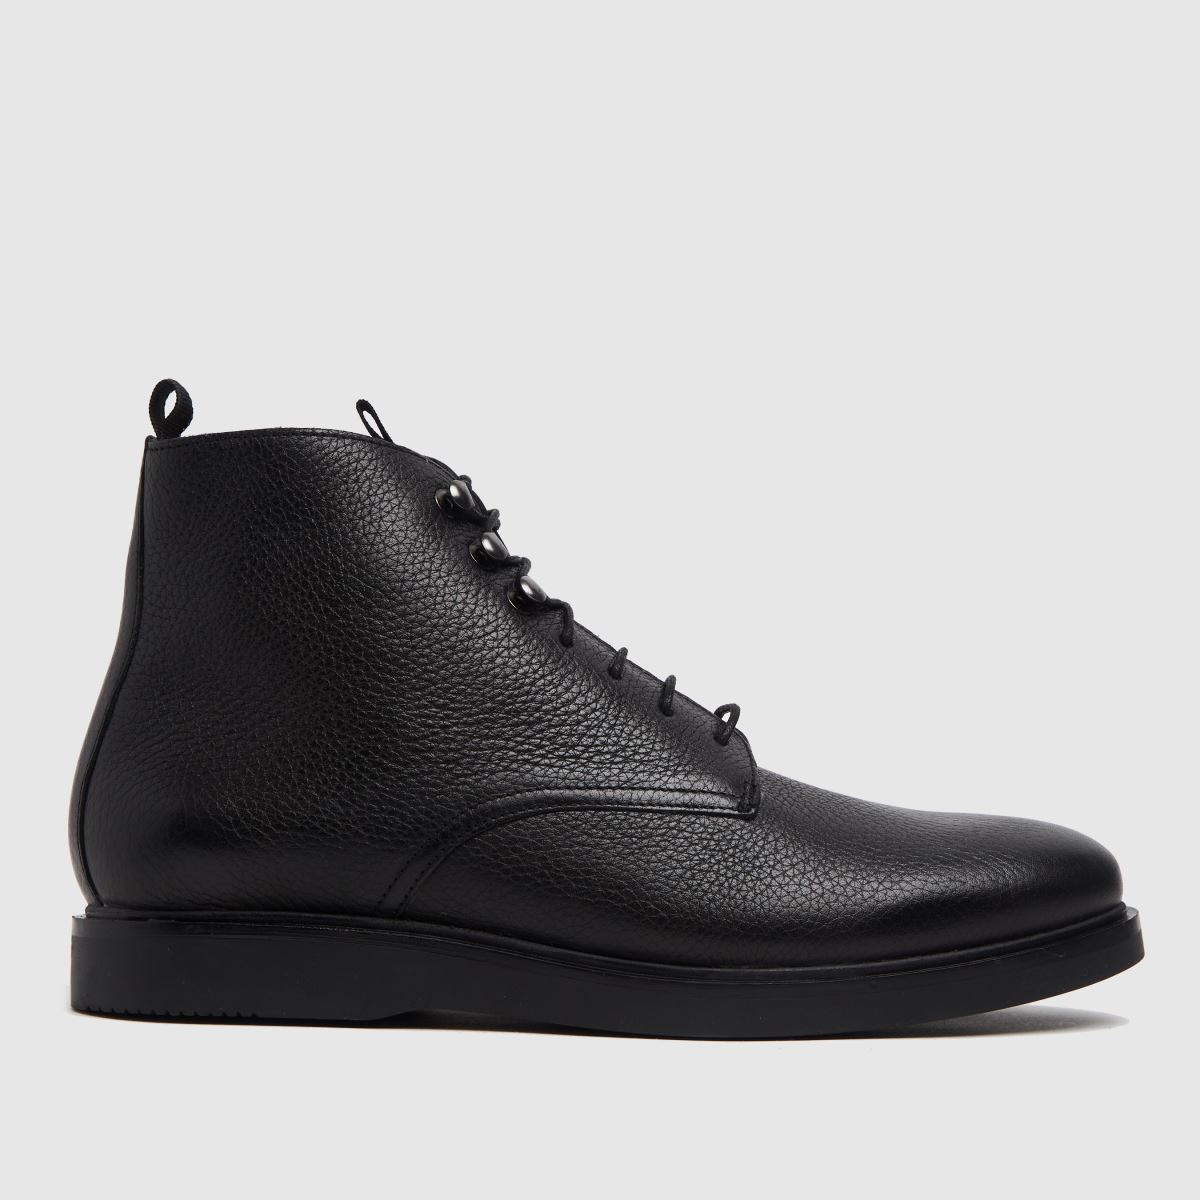 H BY HUDSON Black Battle Boots